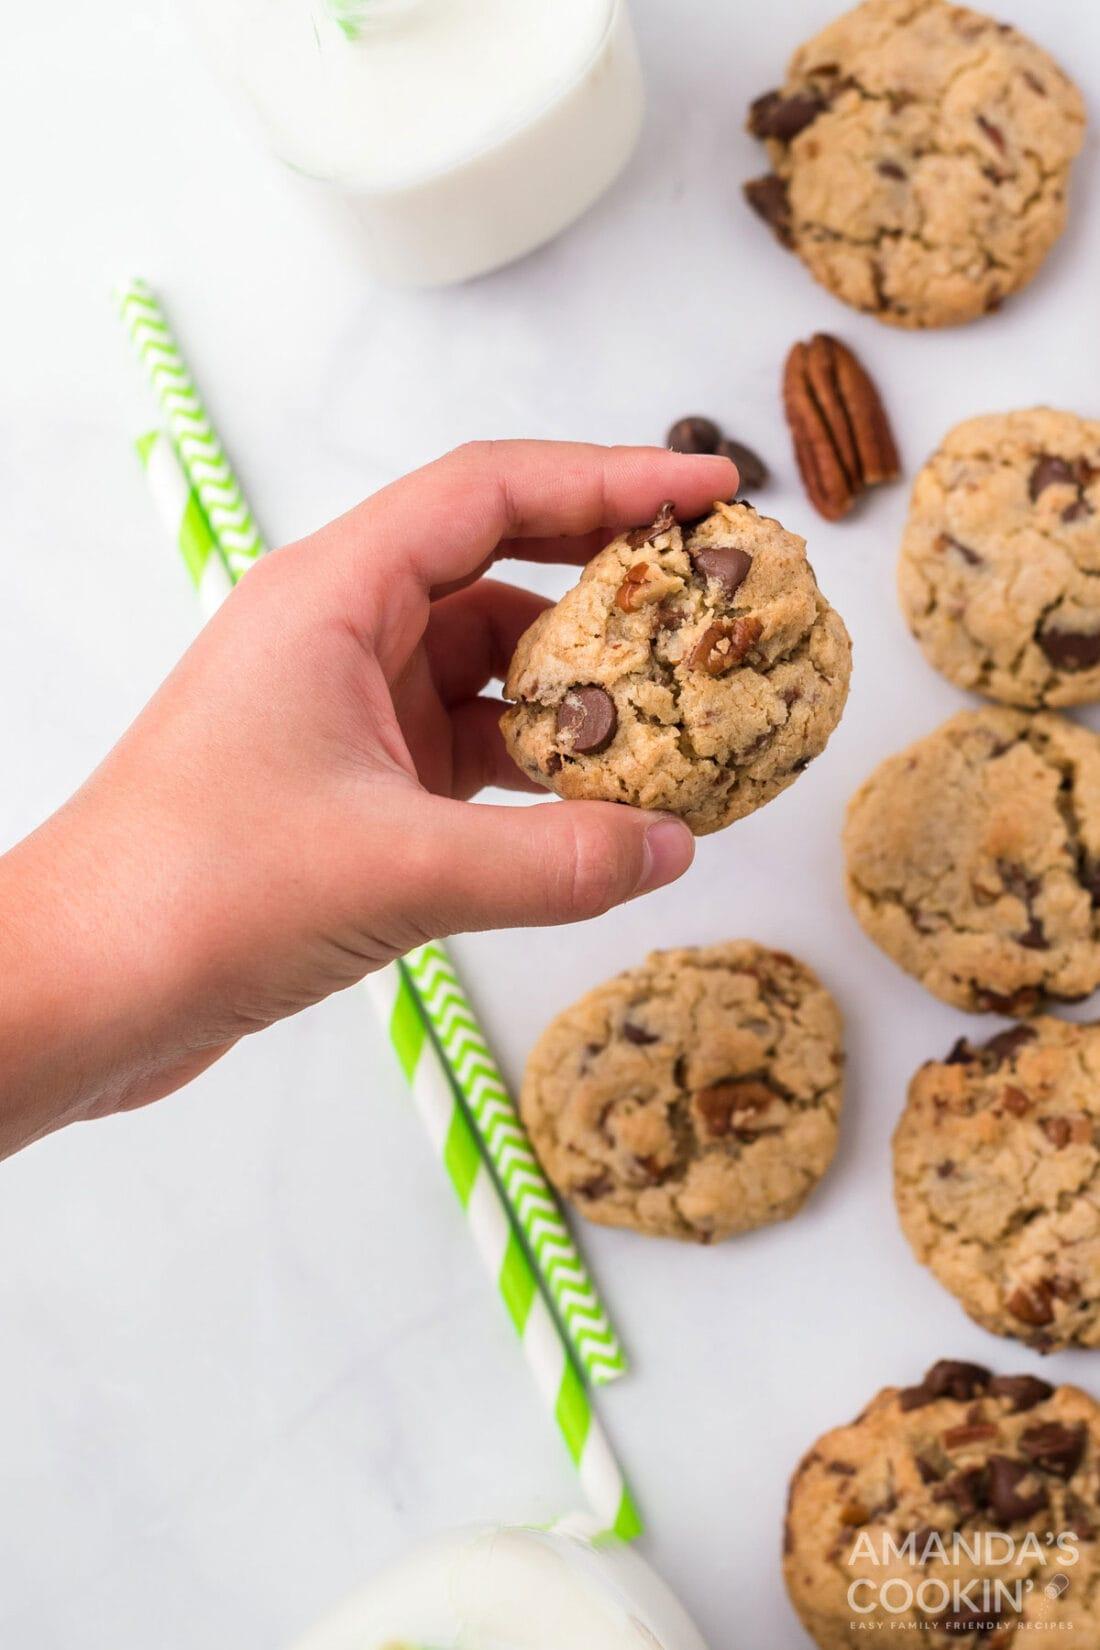 hand holding neiman marcus cookie